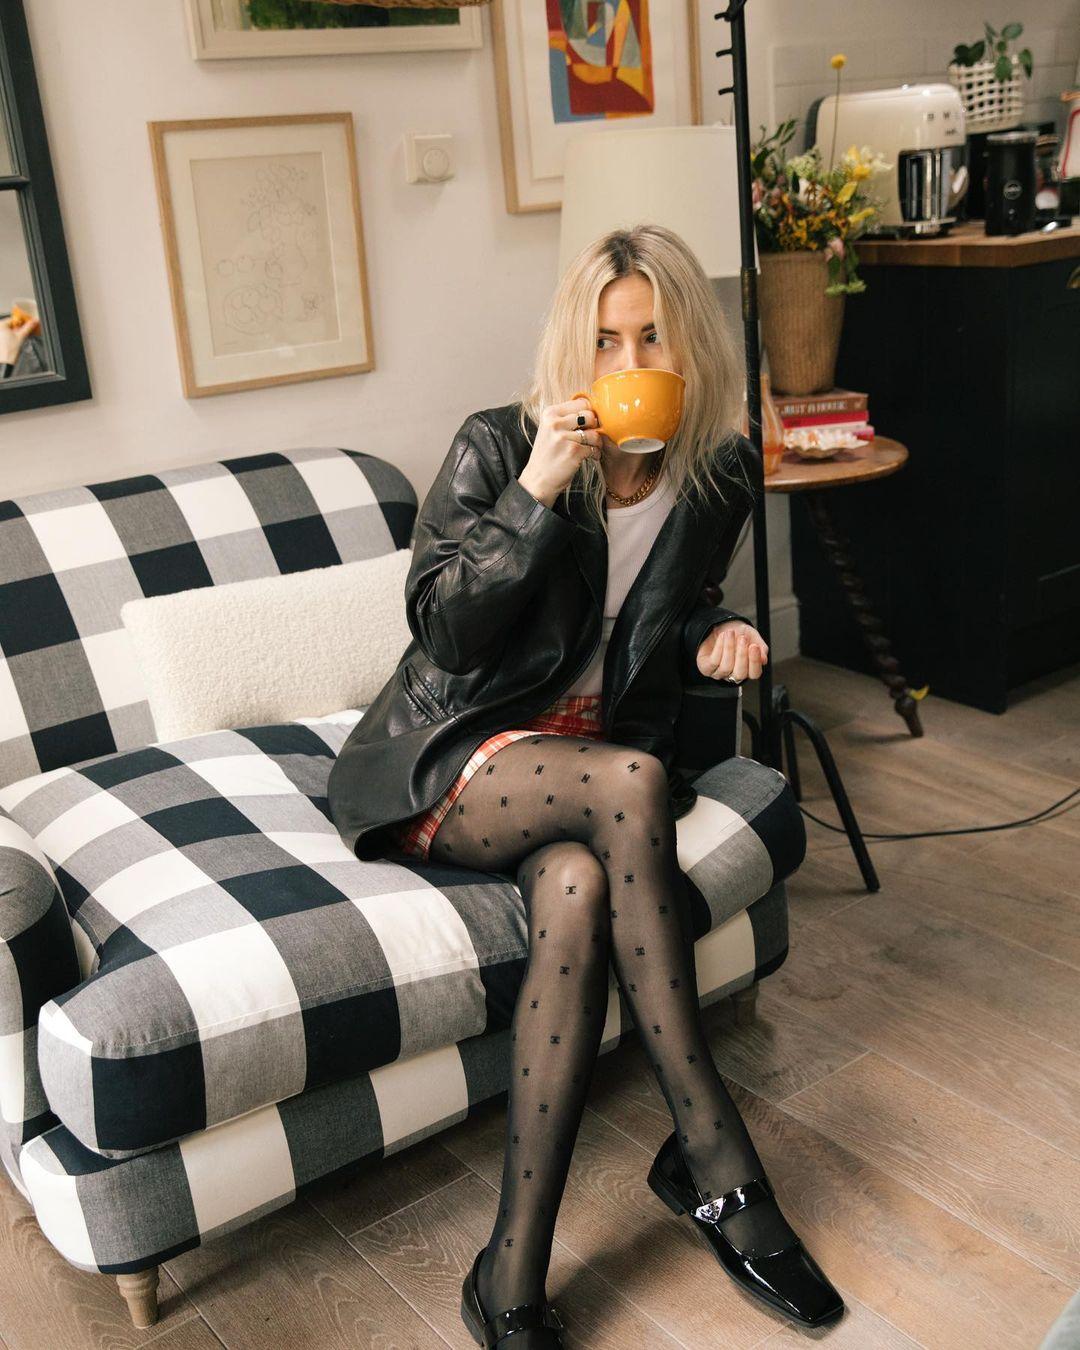 lucy-williams-prada-patent-leather-ballet-flats-instagram.jpg